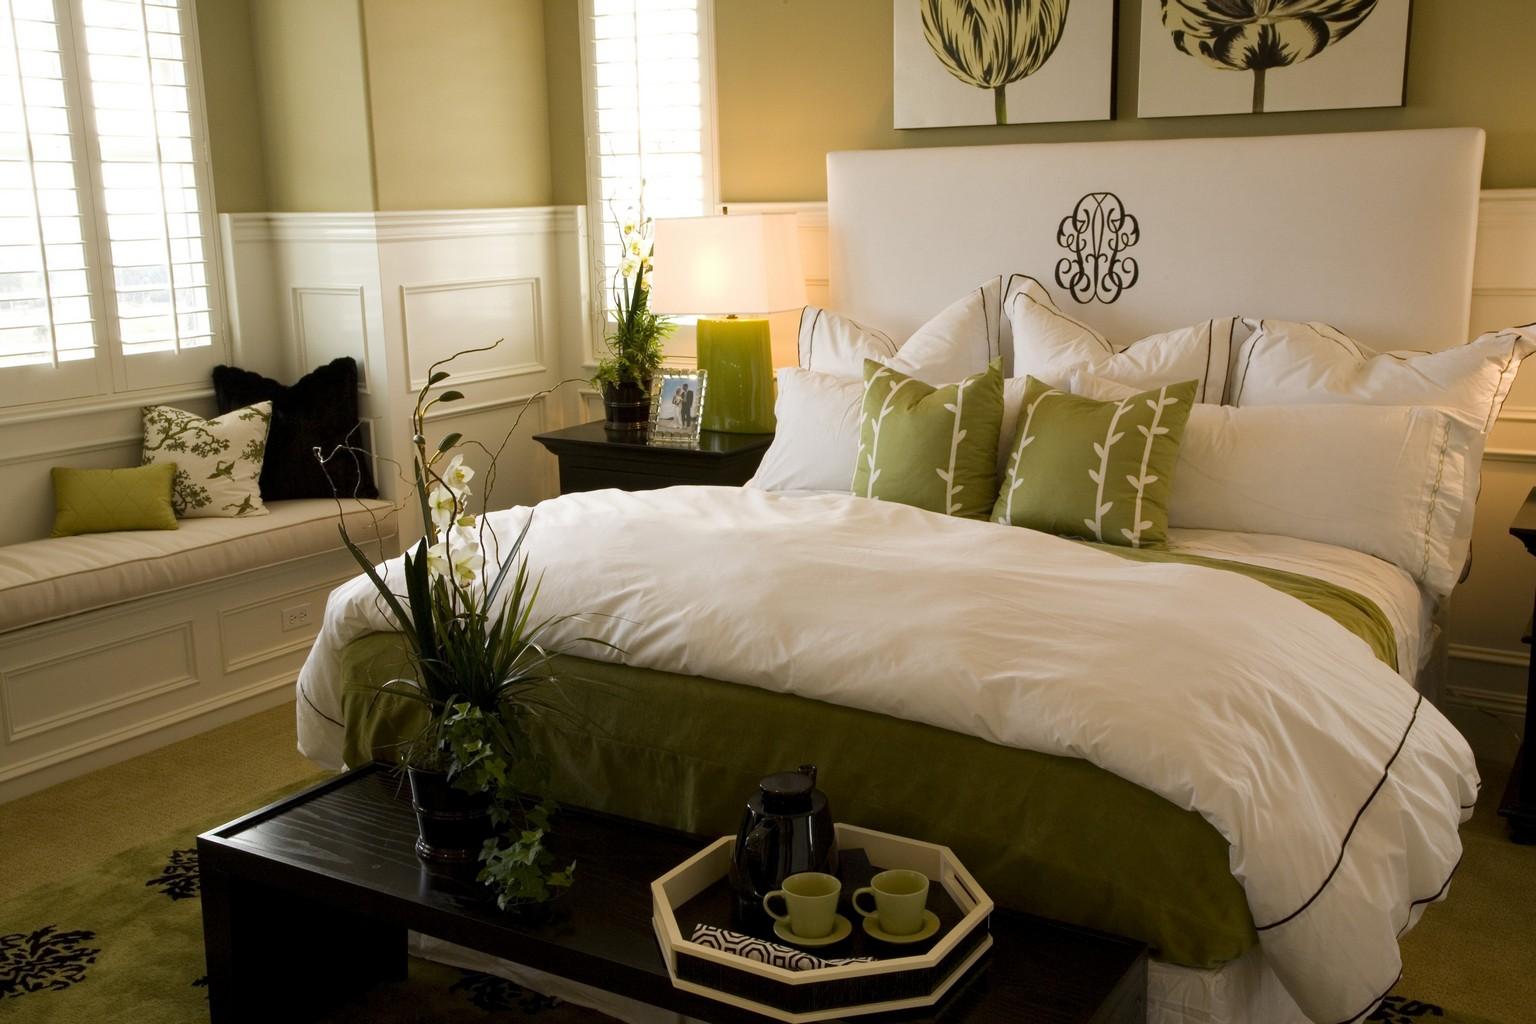 decoration chambre coucher moderne feng shui bedroom idea - Deco Chambre A Coucher Adulte 2015